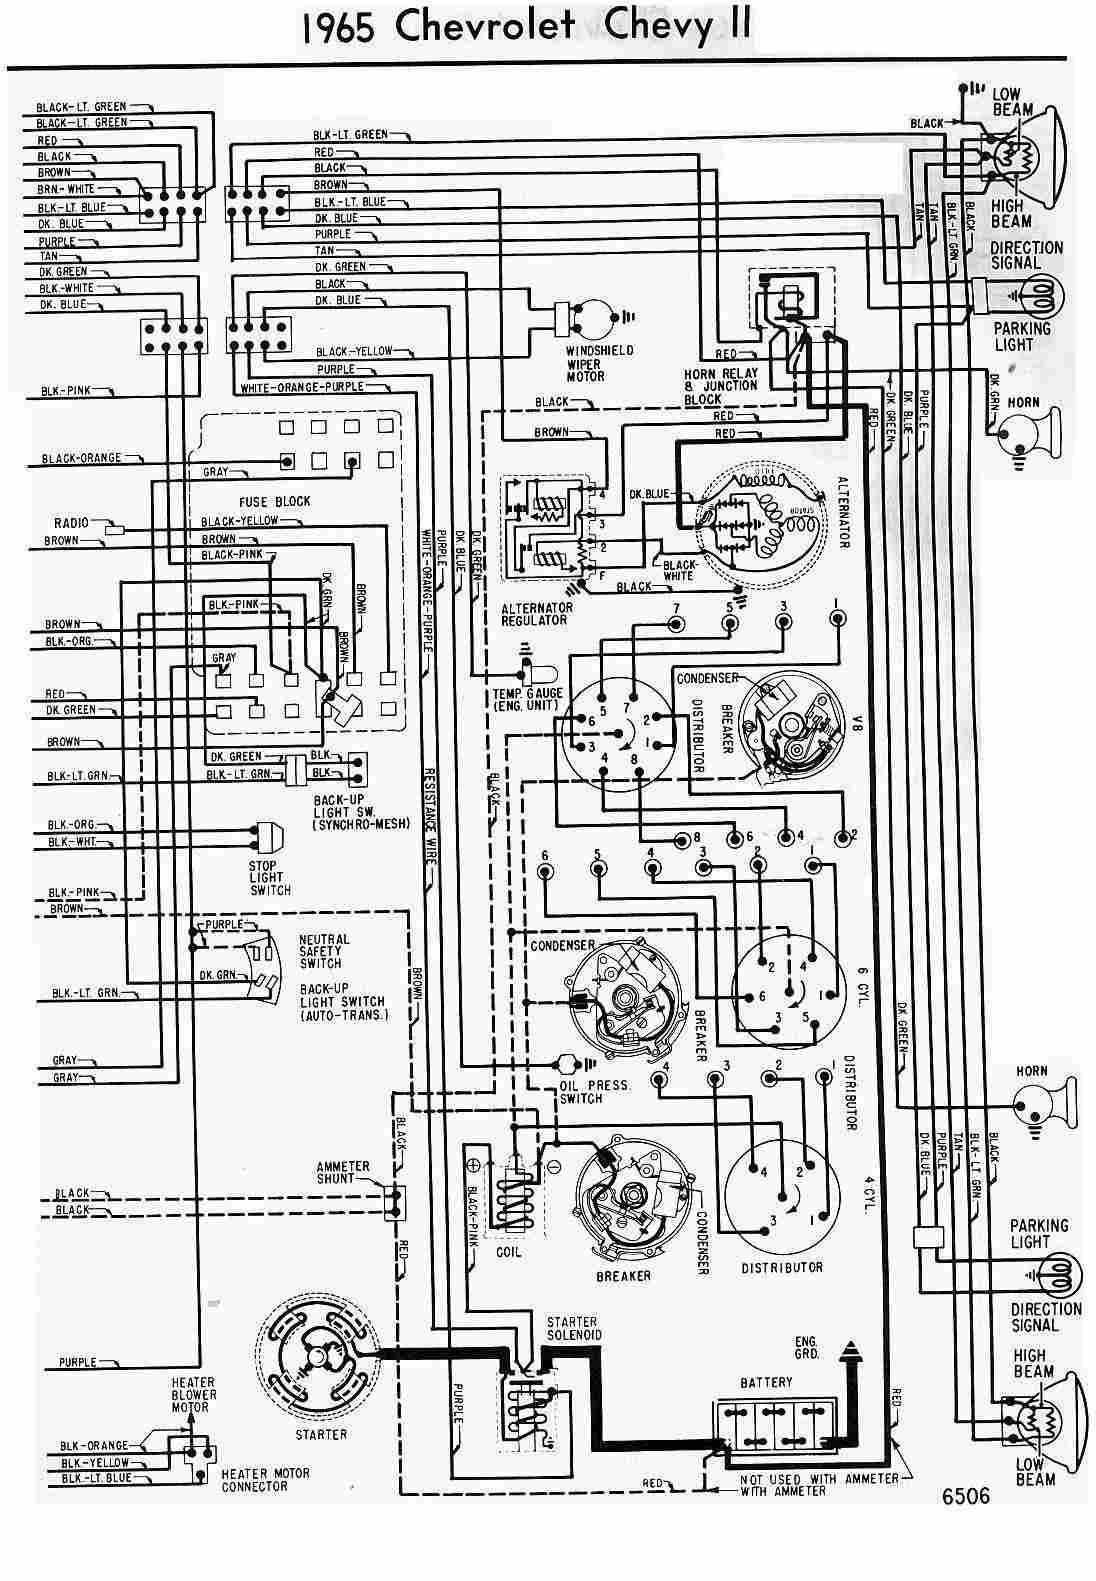 small resolution of 1976 corvette dash wiring diagram schematic simple wiring diagramswiring diagram 1964 chevy corvette wiring diagrams 1977